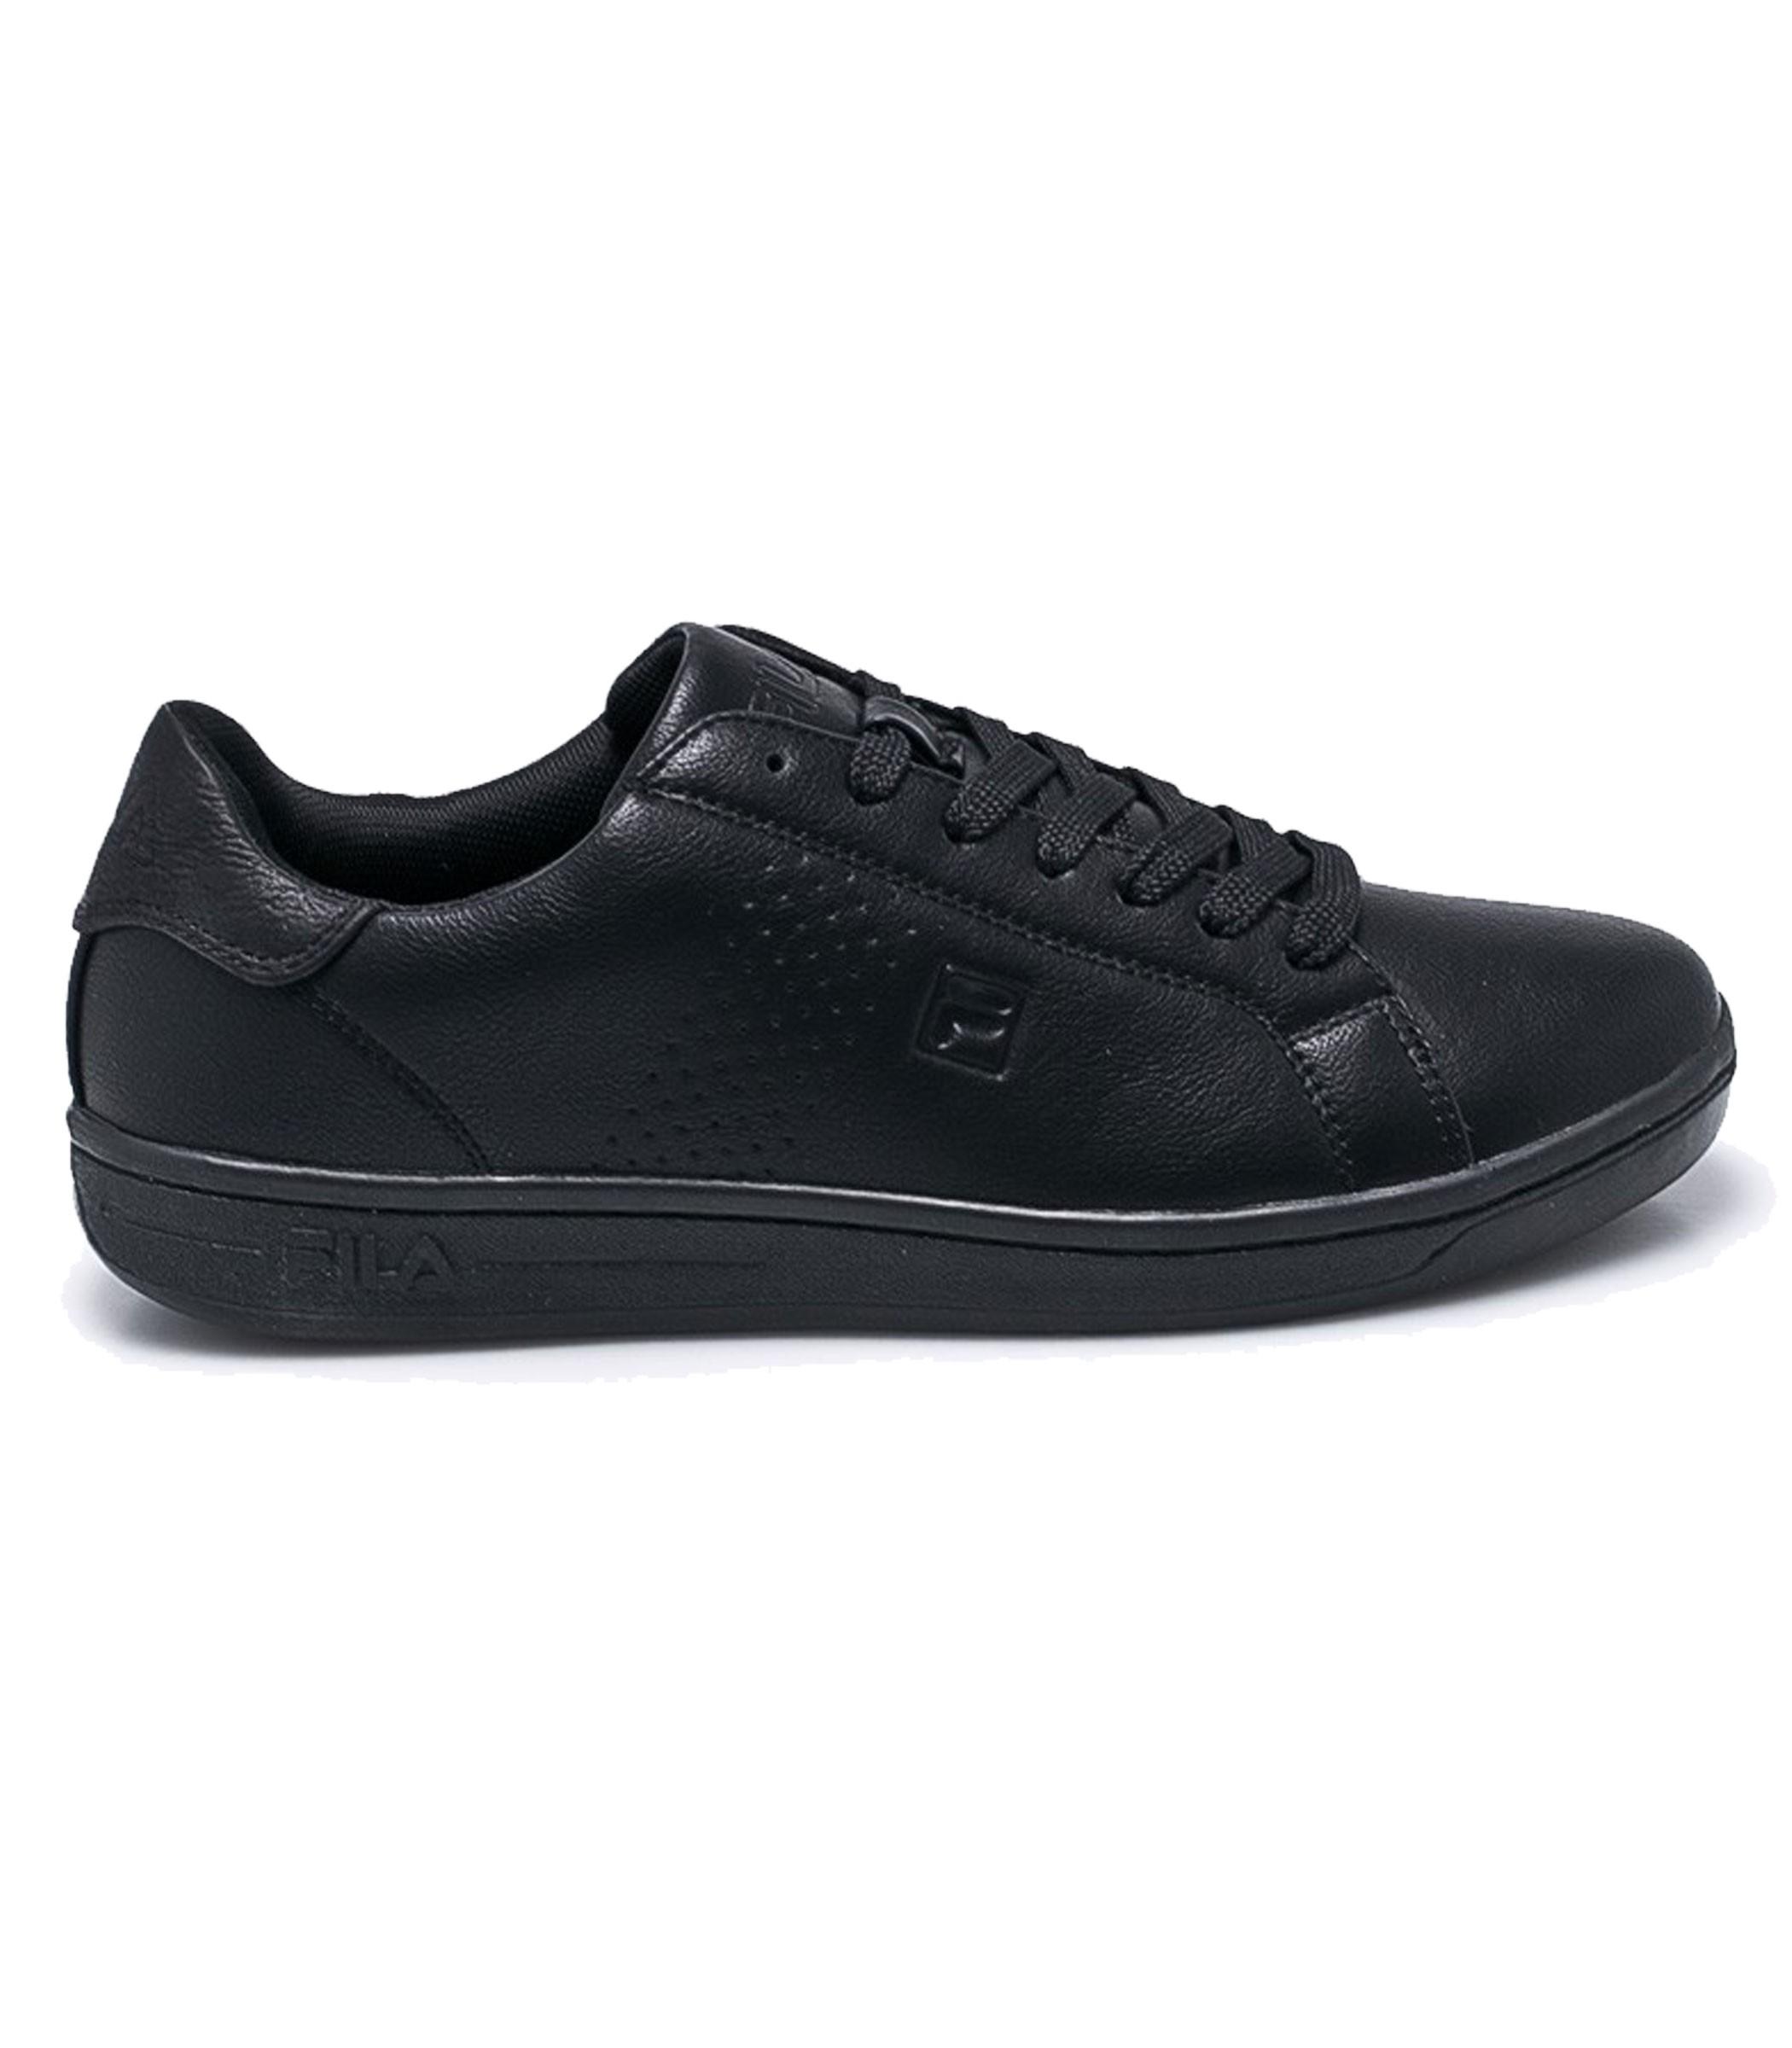 Low Crosscourt Da 12v Uomo Sneakers Fila 2 Scarpe Rif 1010274 wHaIZUp